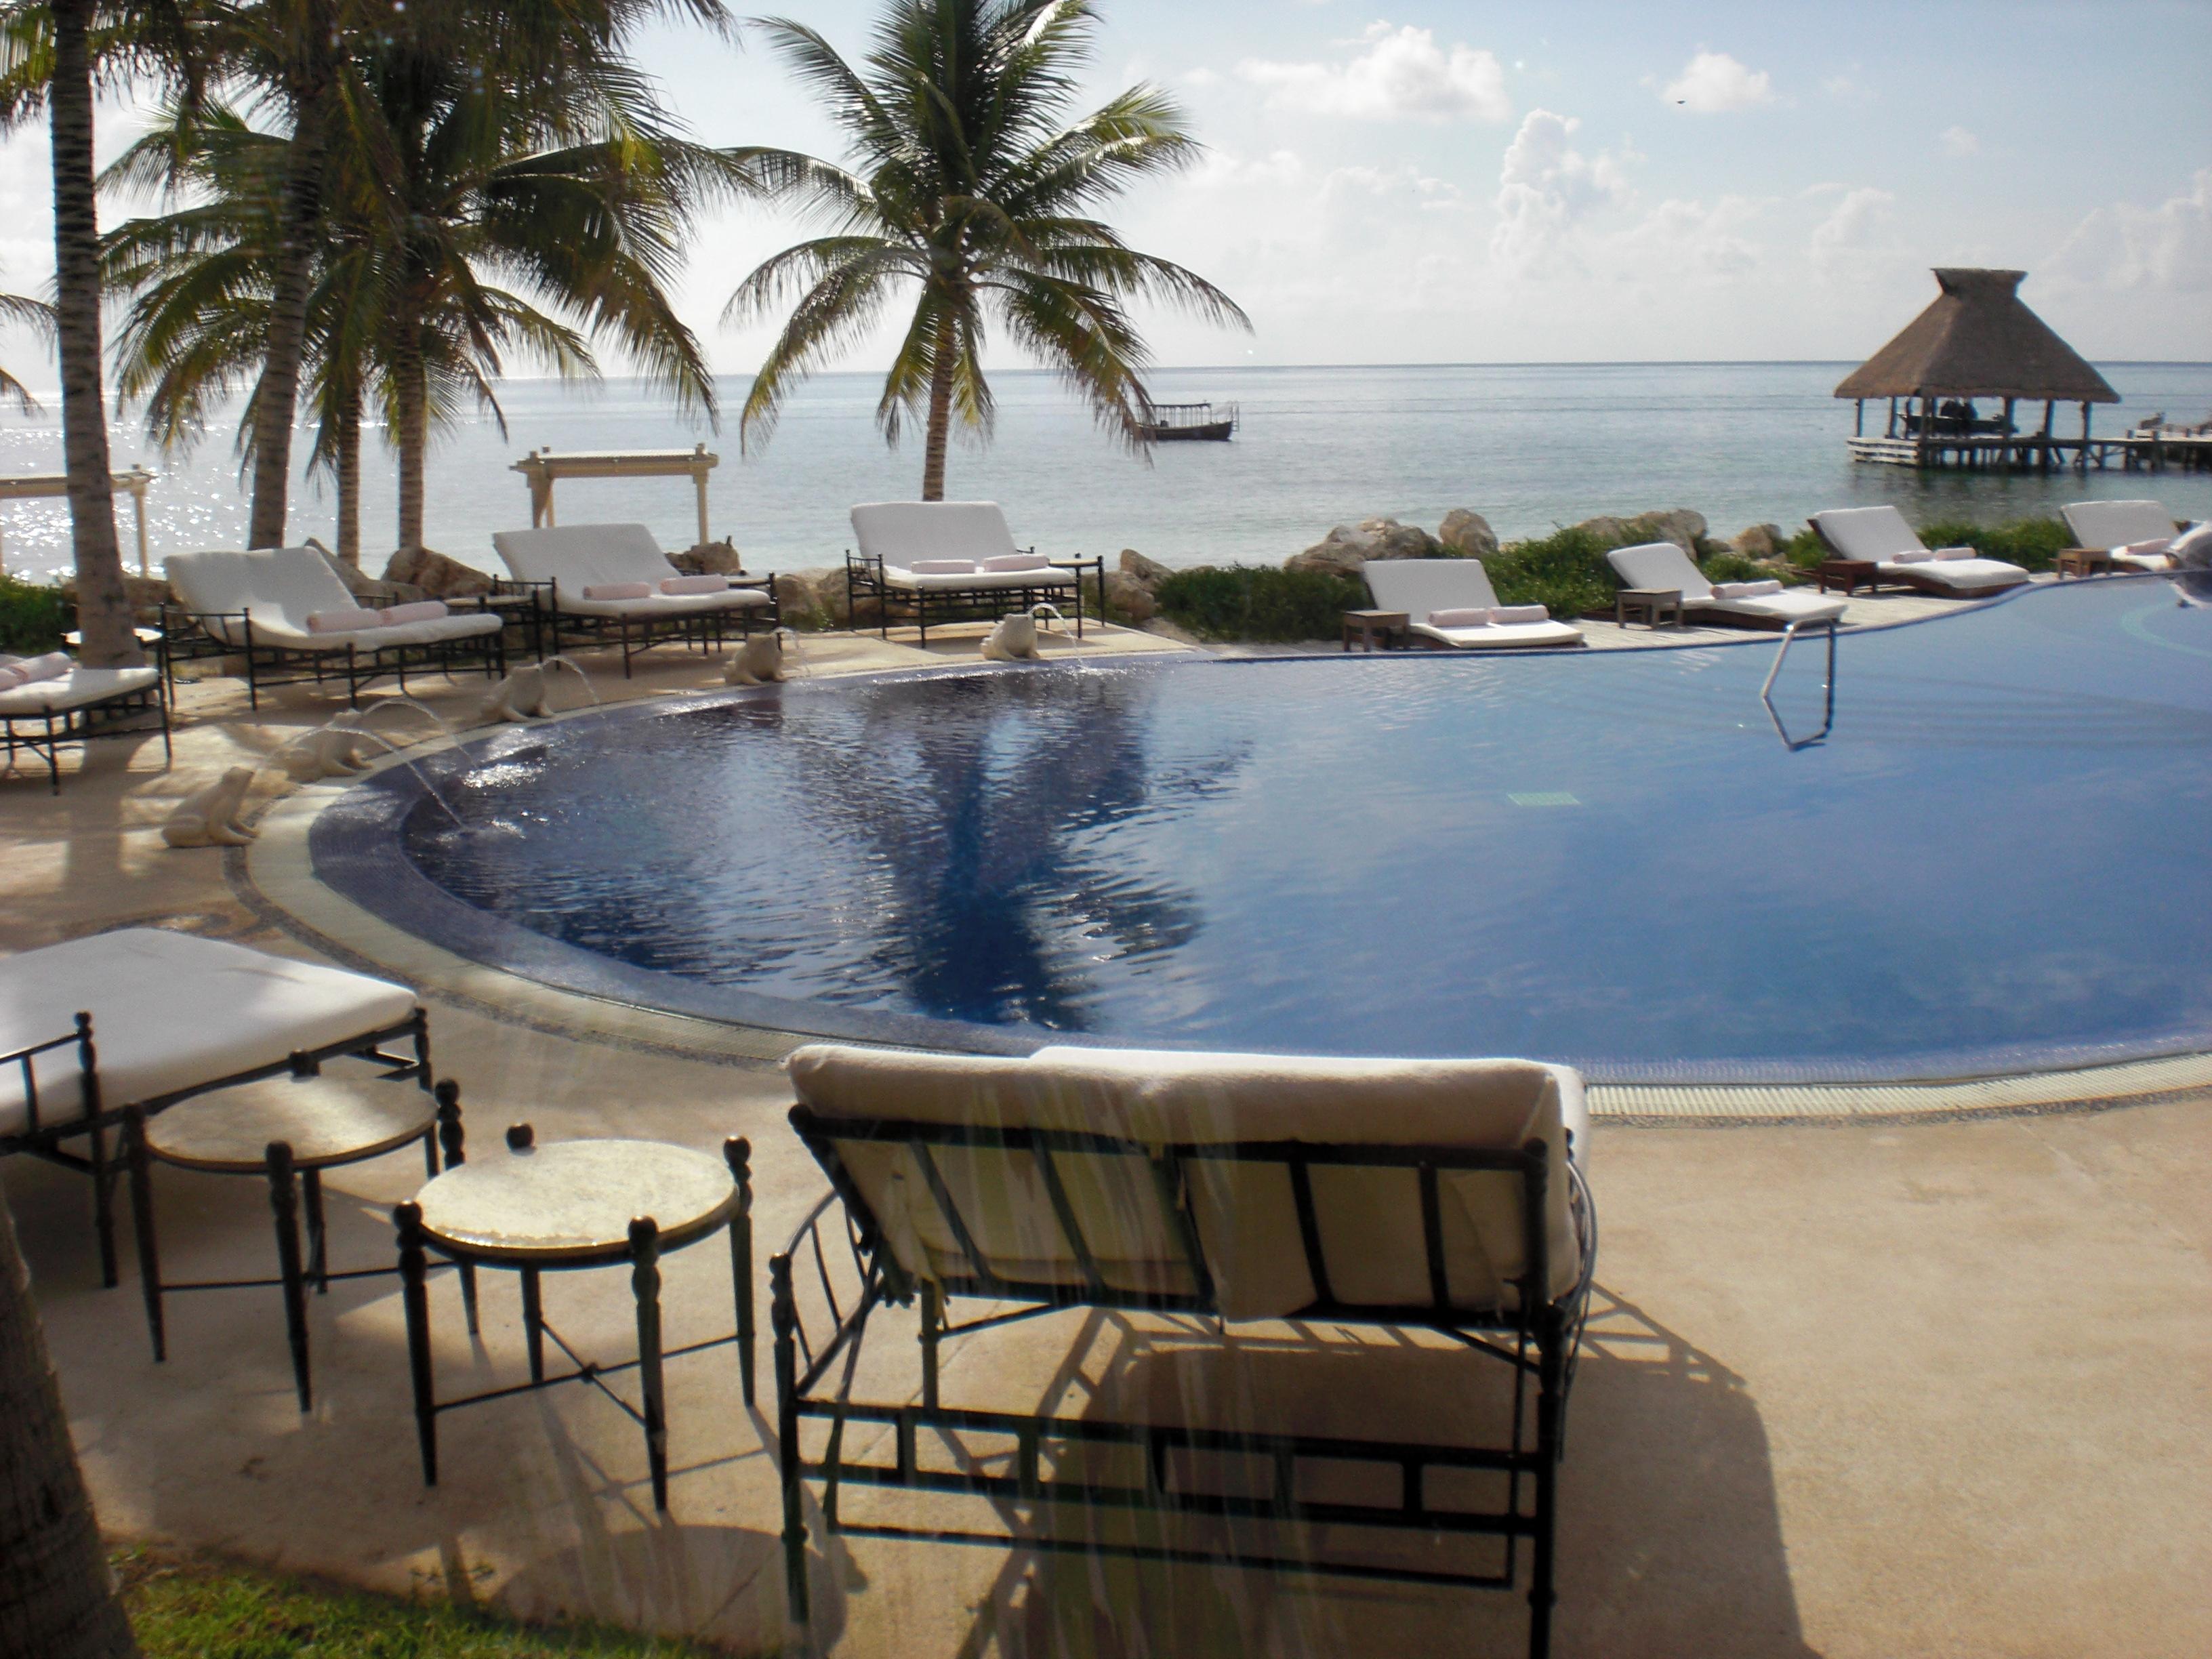 Zoetry Agua Punta Cana honeymoon review, best honeymoon review, Bliss Honeymoons review, Zoetry reviews